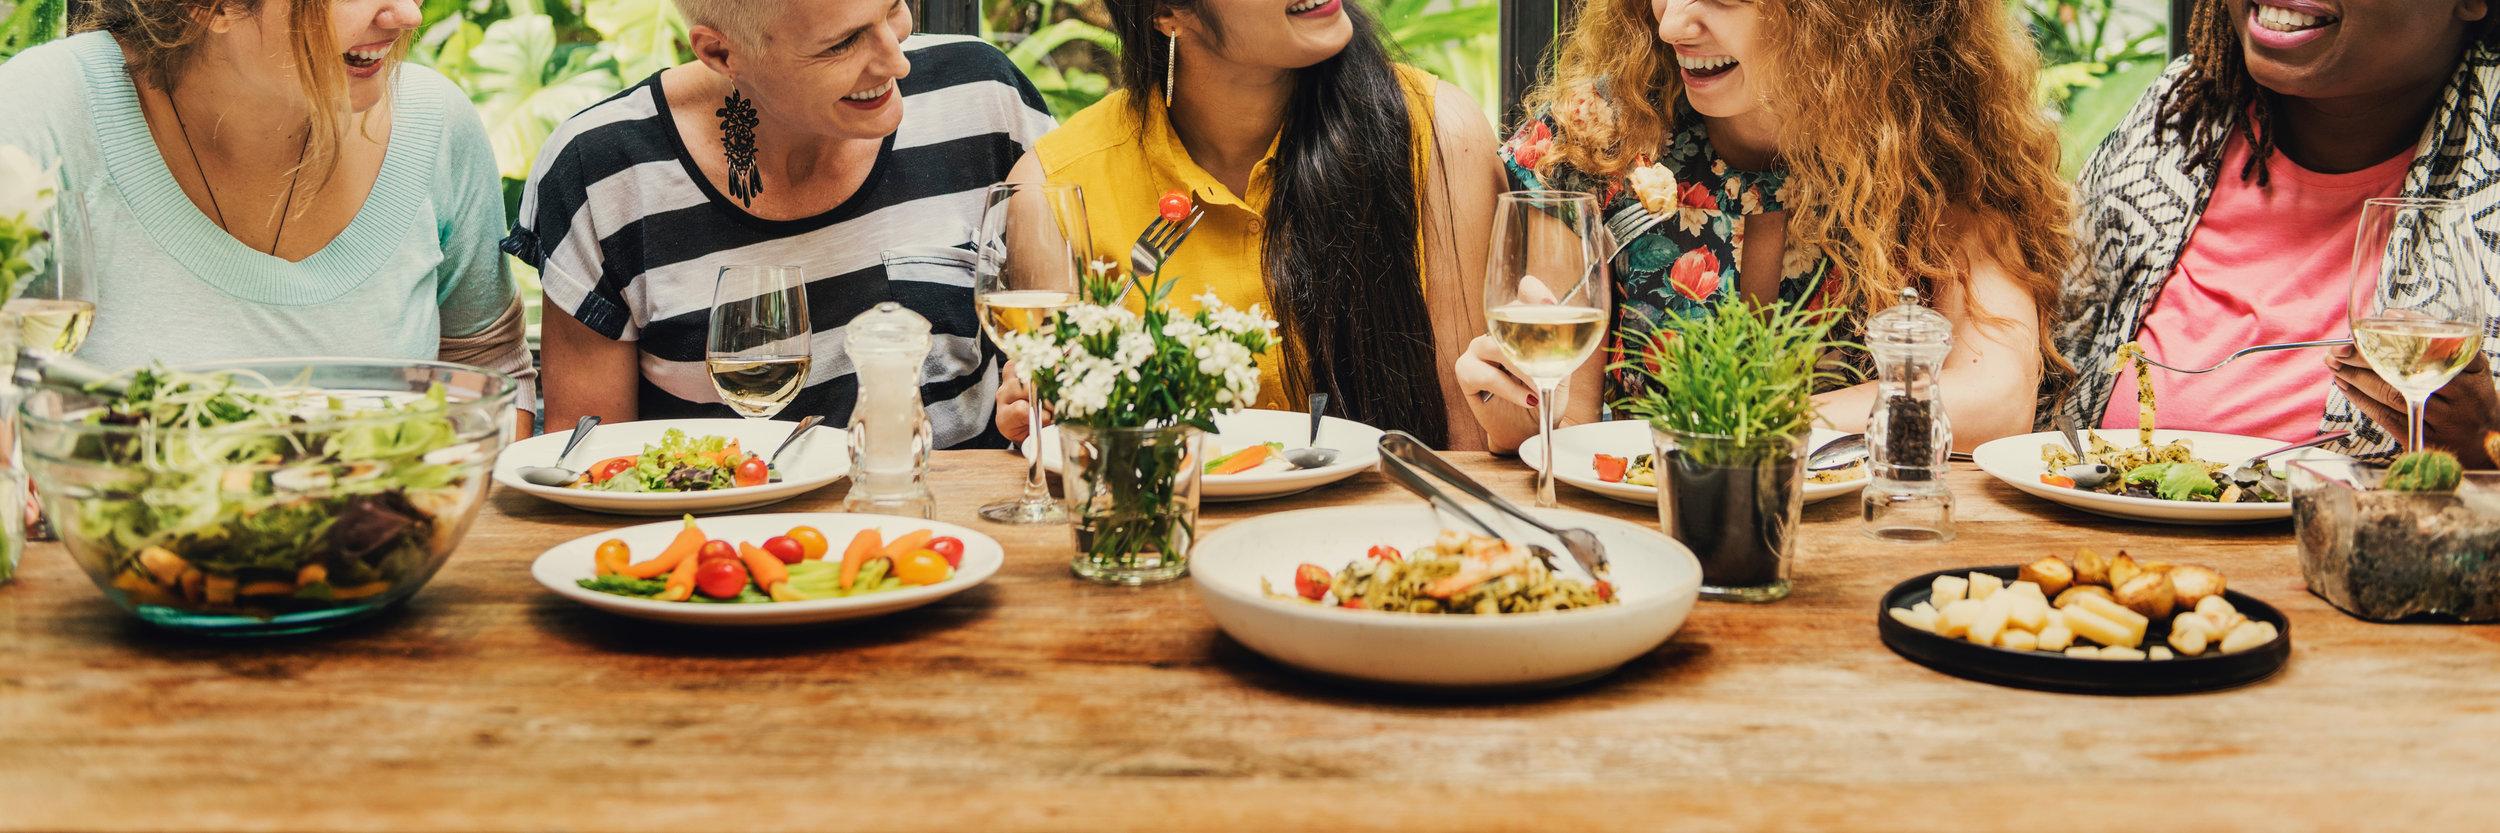 women-communication-dinner-together-concept-PPC49AL.jpeg